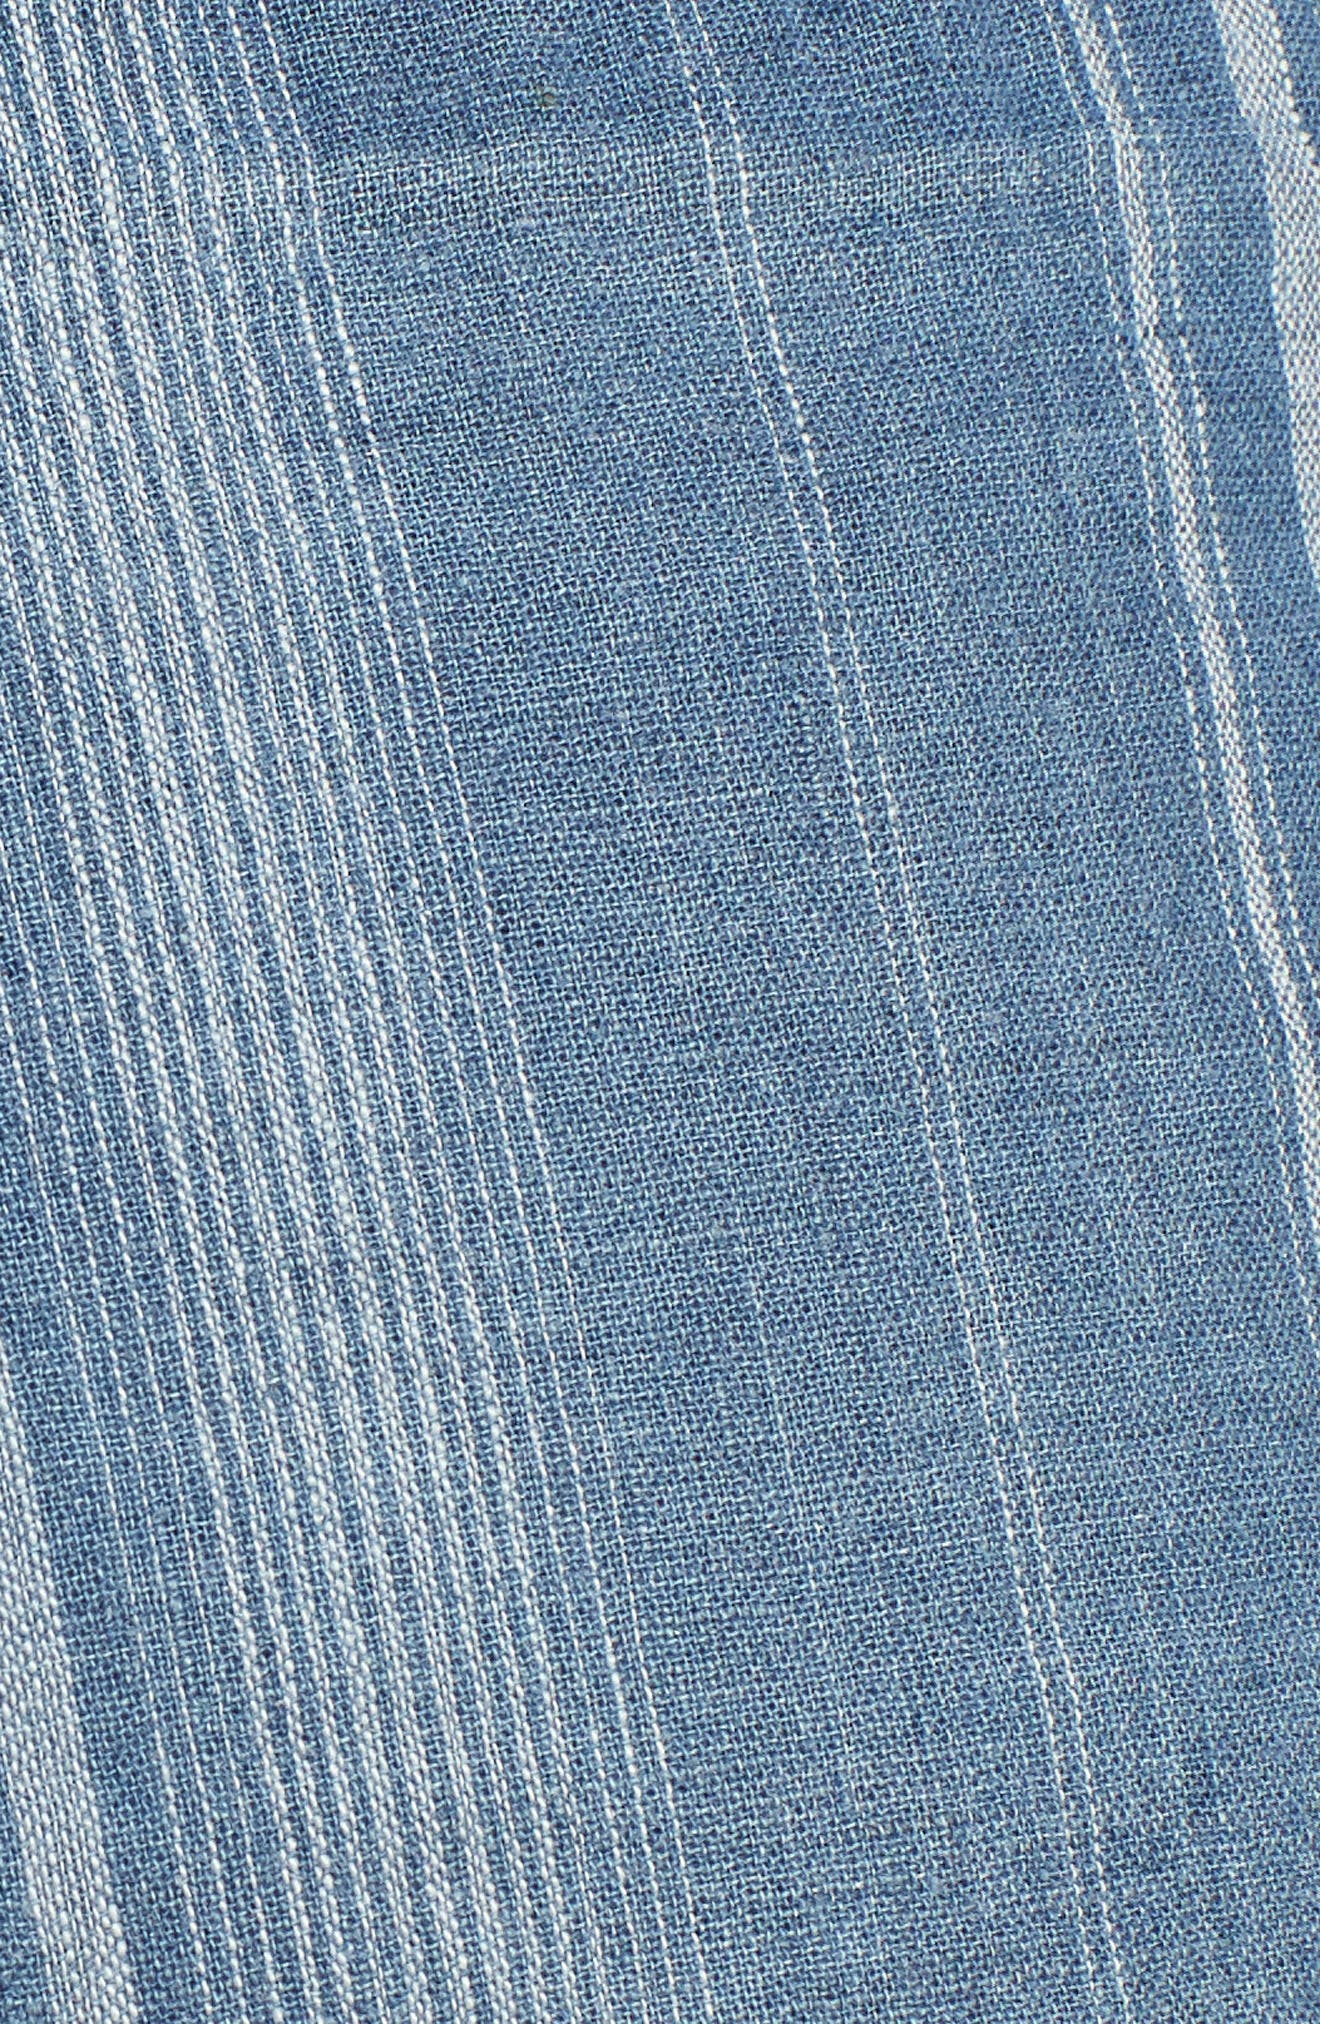 High Rise Striped Shorts,                             Alternate thumbnail 6, color,                             420